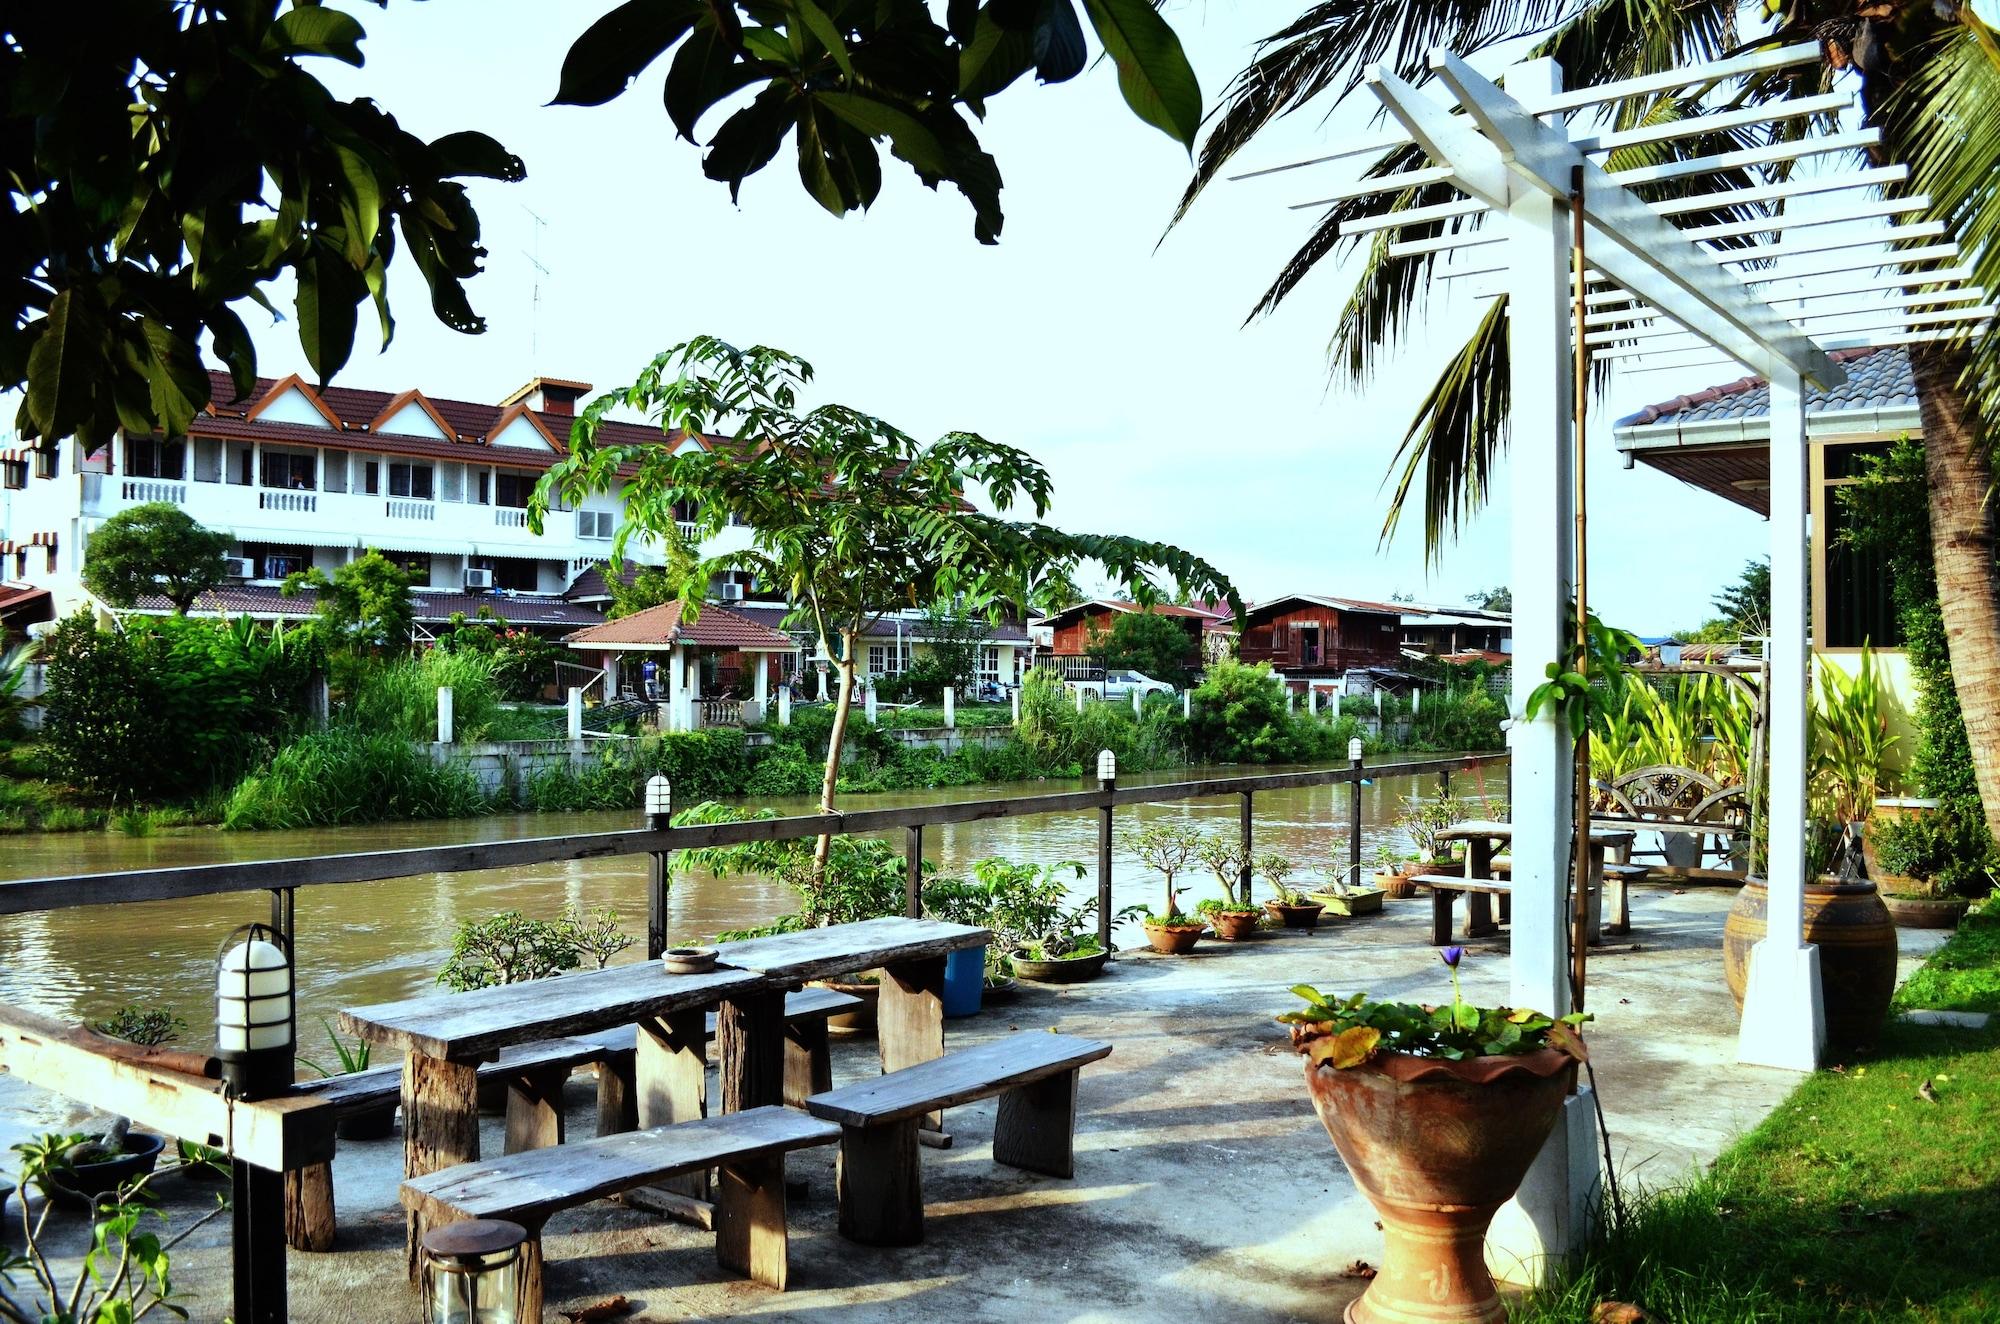 Water Front - Hostel, Phra Nakhon Si Ayutthaya